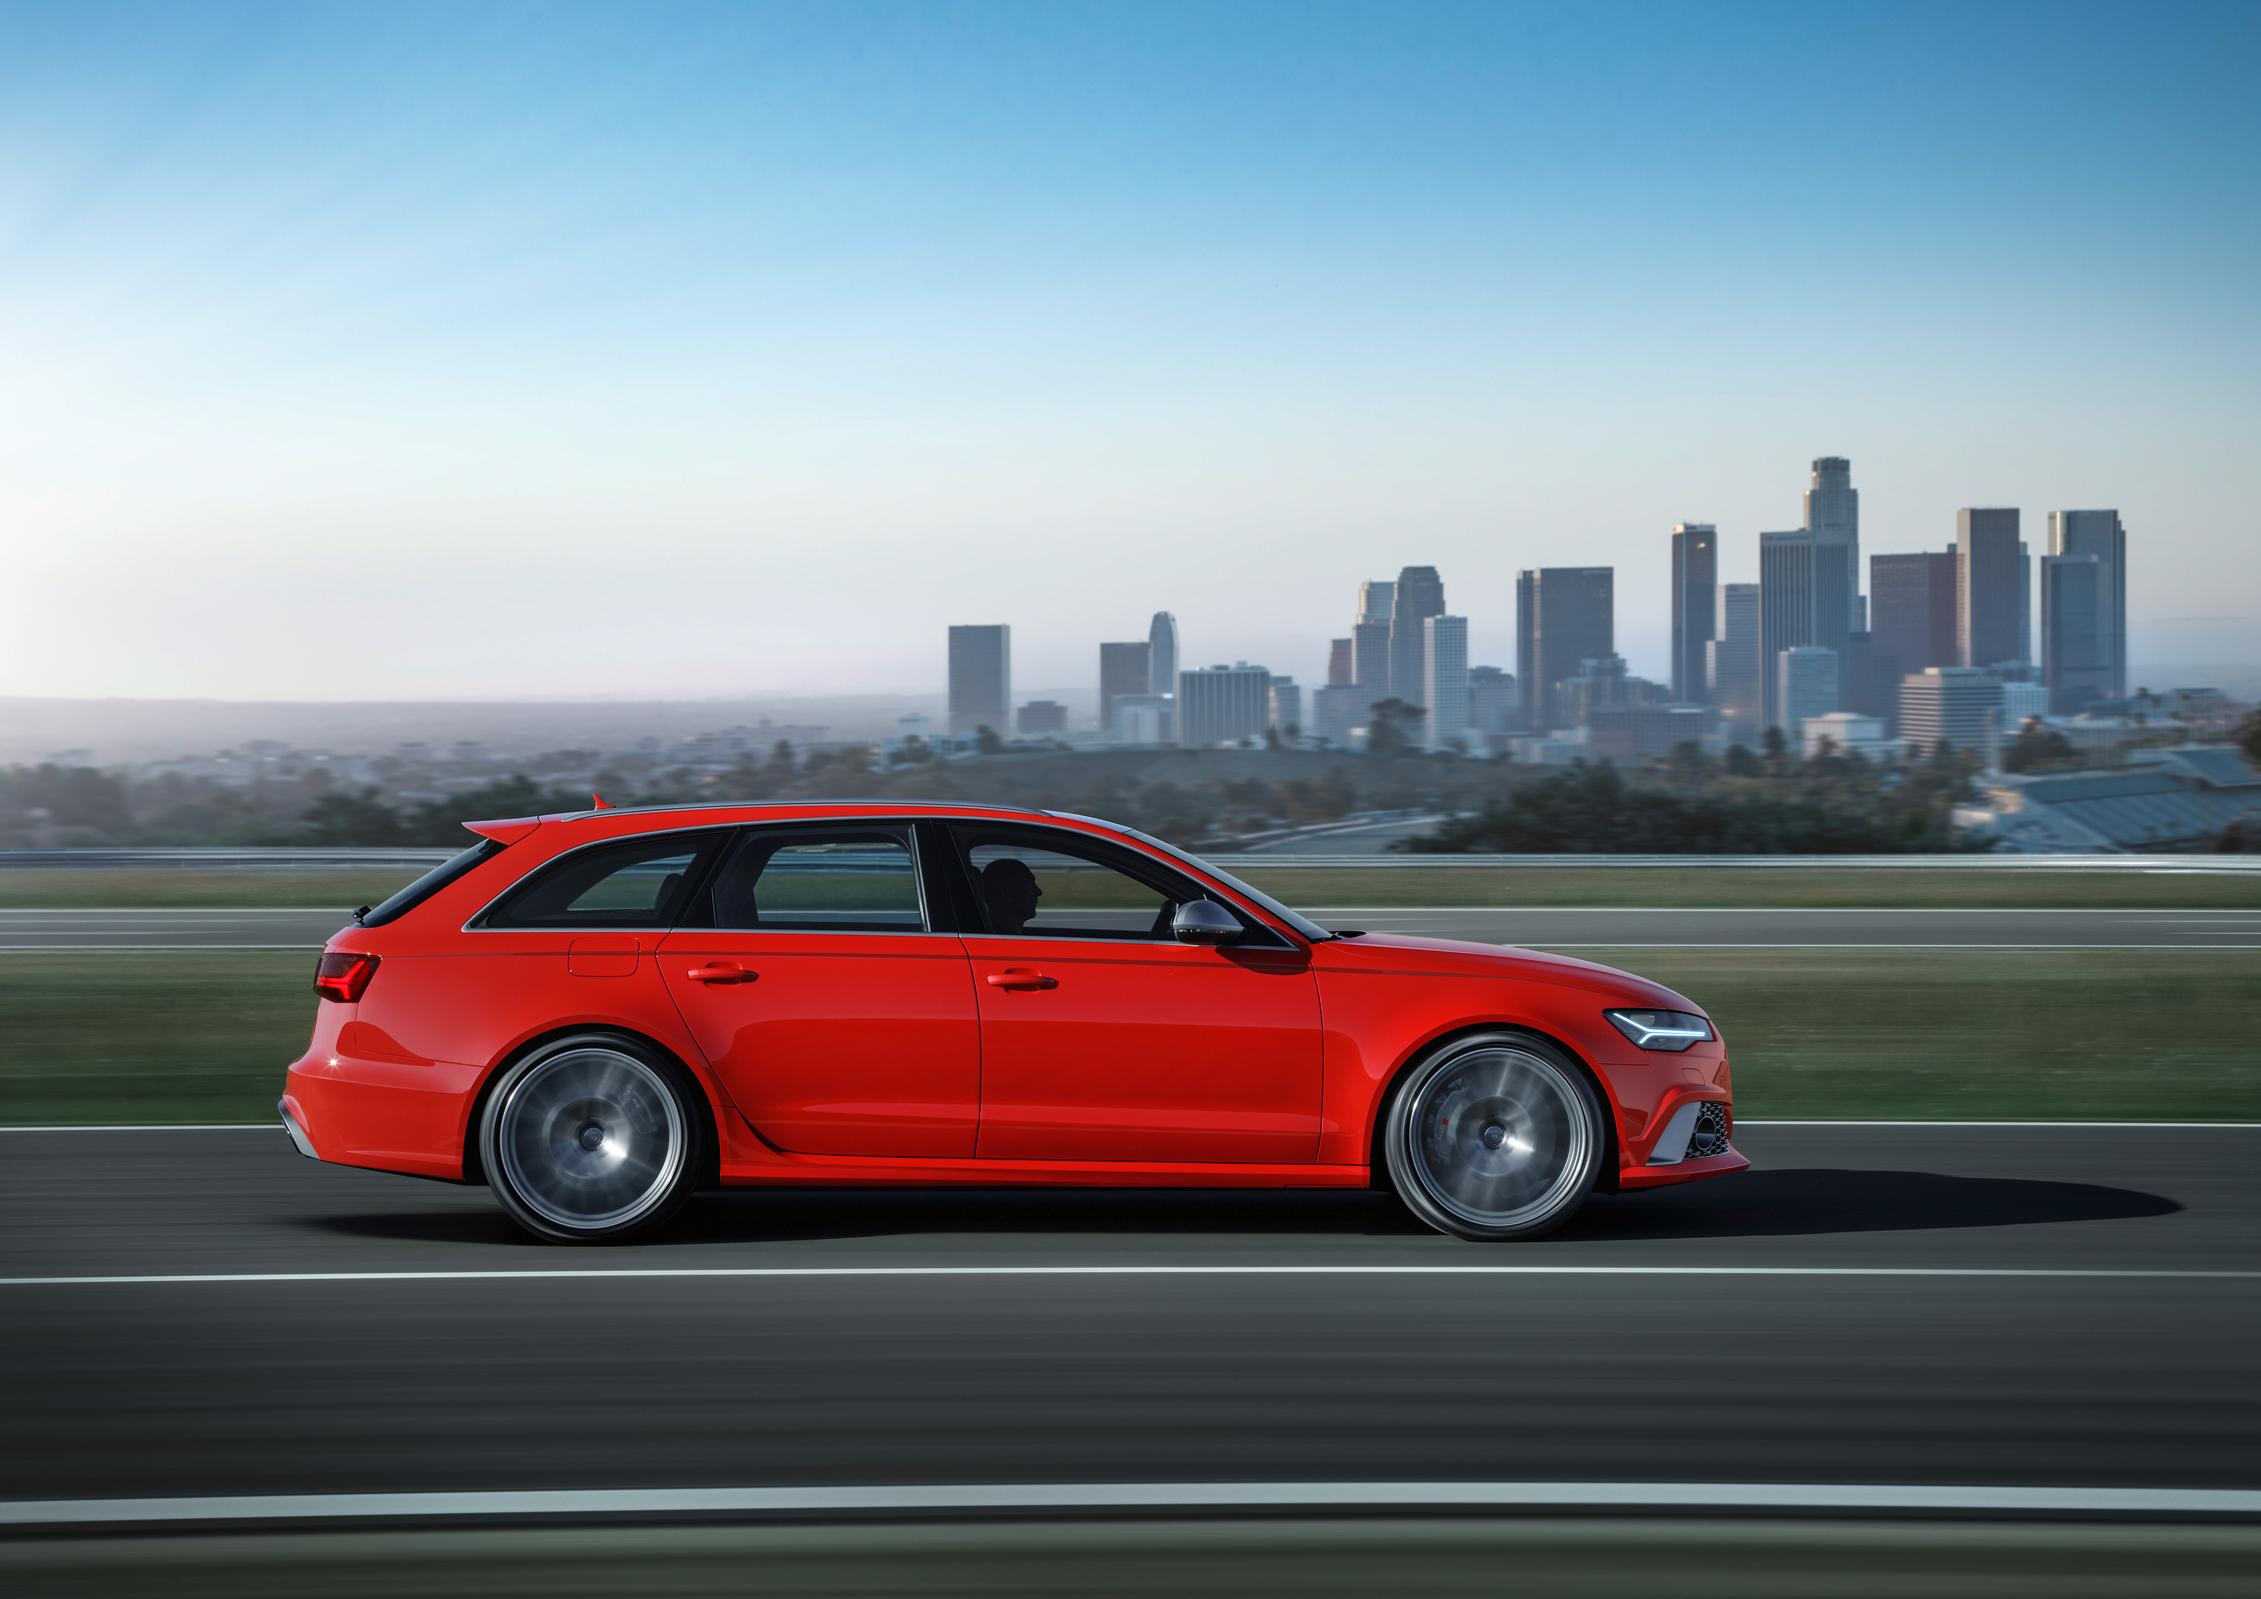 Neuvorstellung: Audi RS6 Avant performance